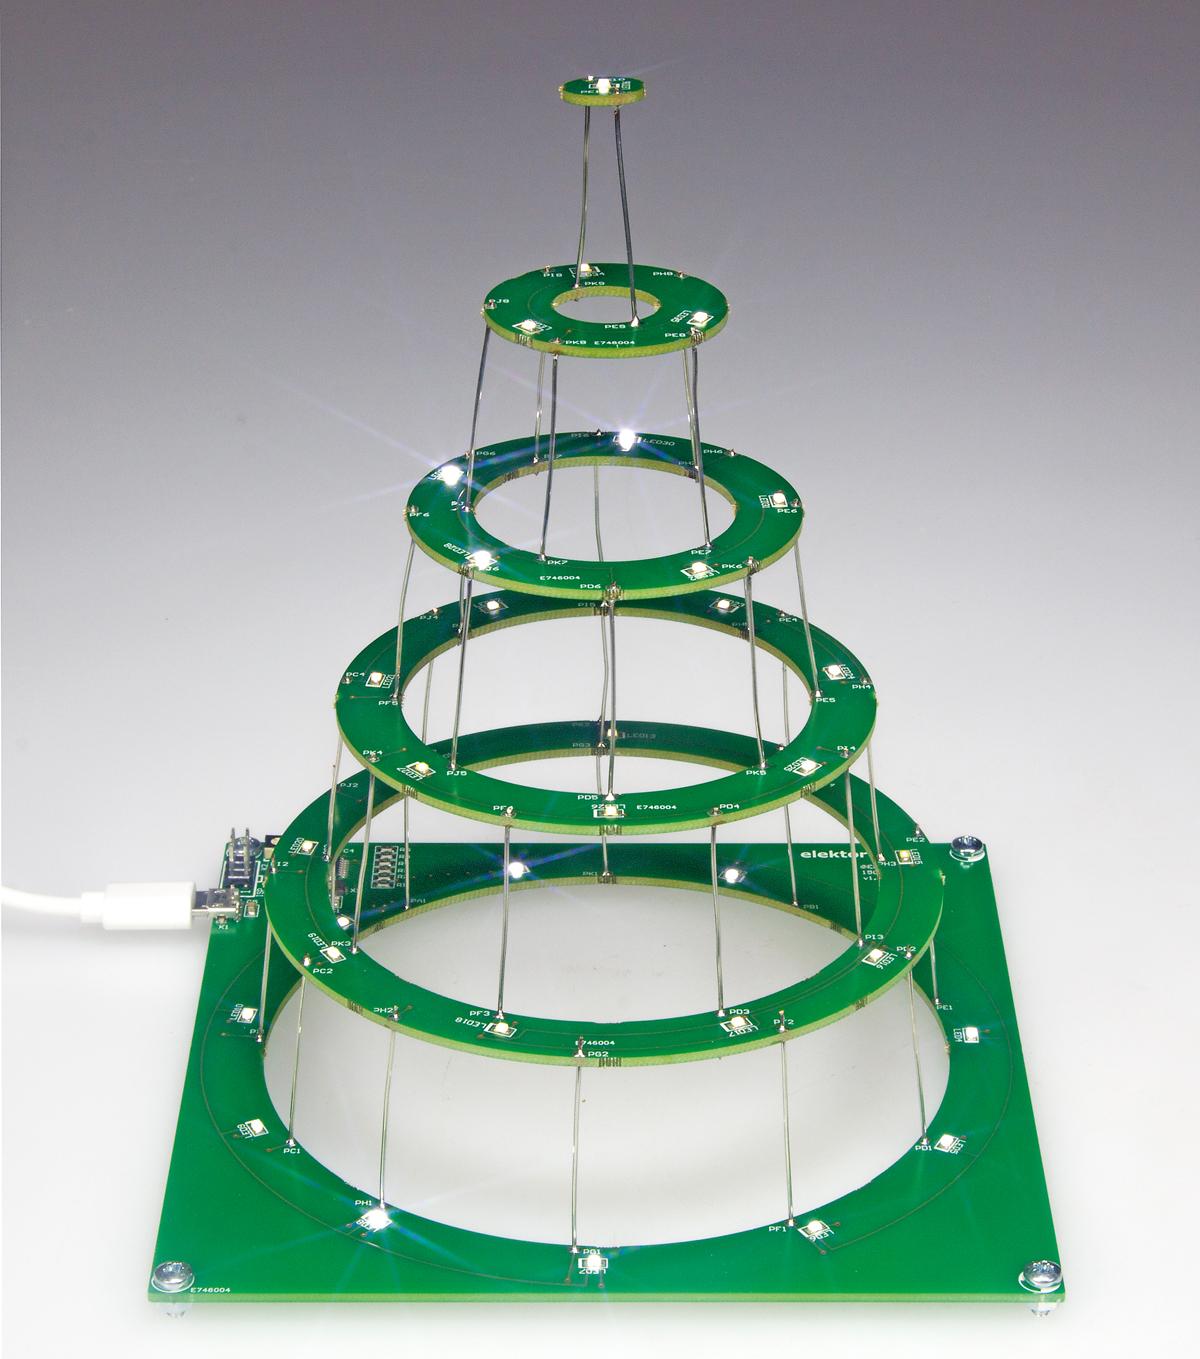 Circular Christmas Tree 150453 Elektor Labs Magazine Light Wiring Diagrams Test